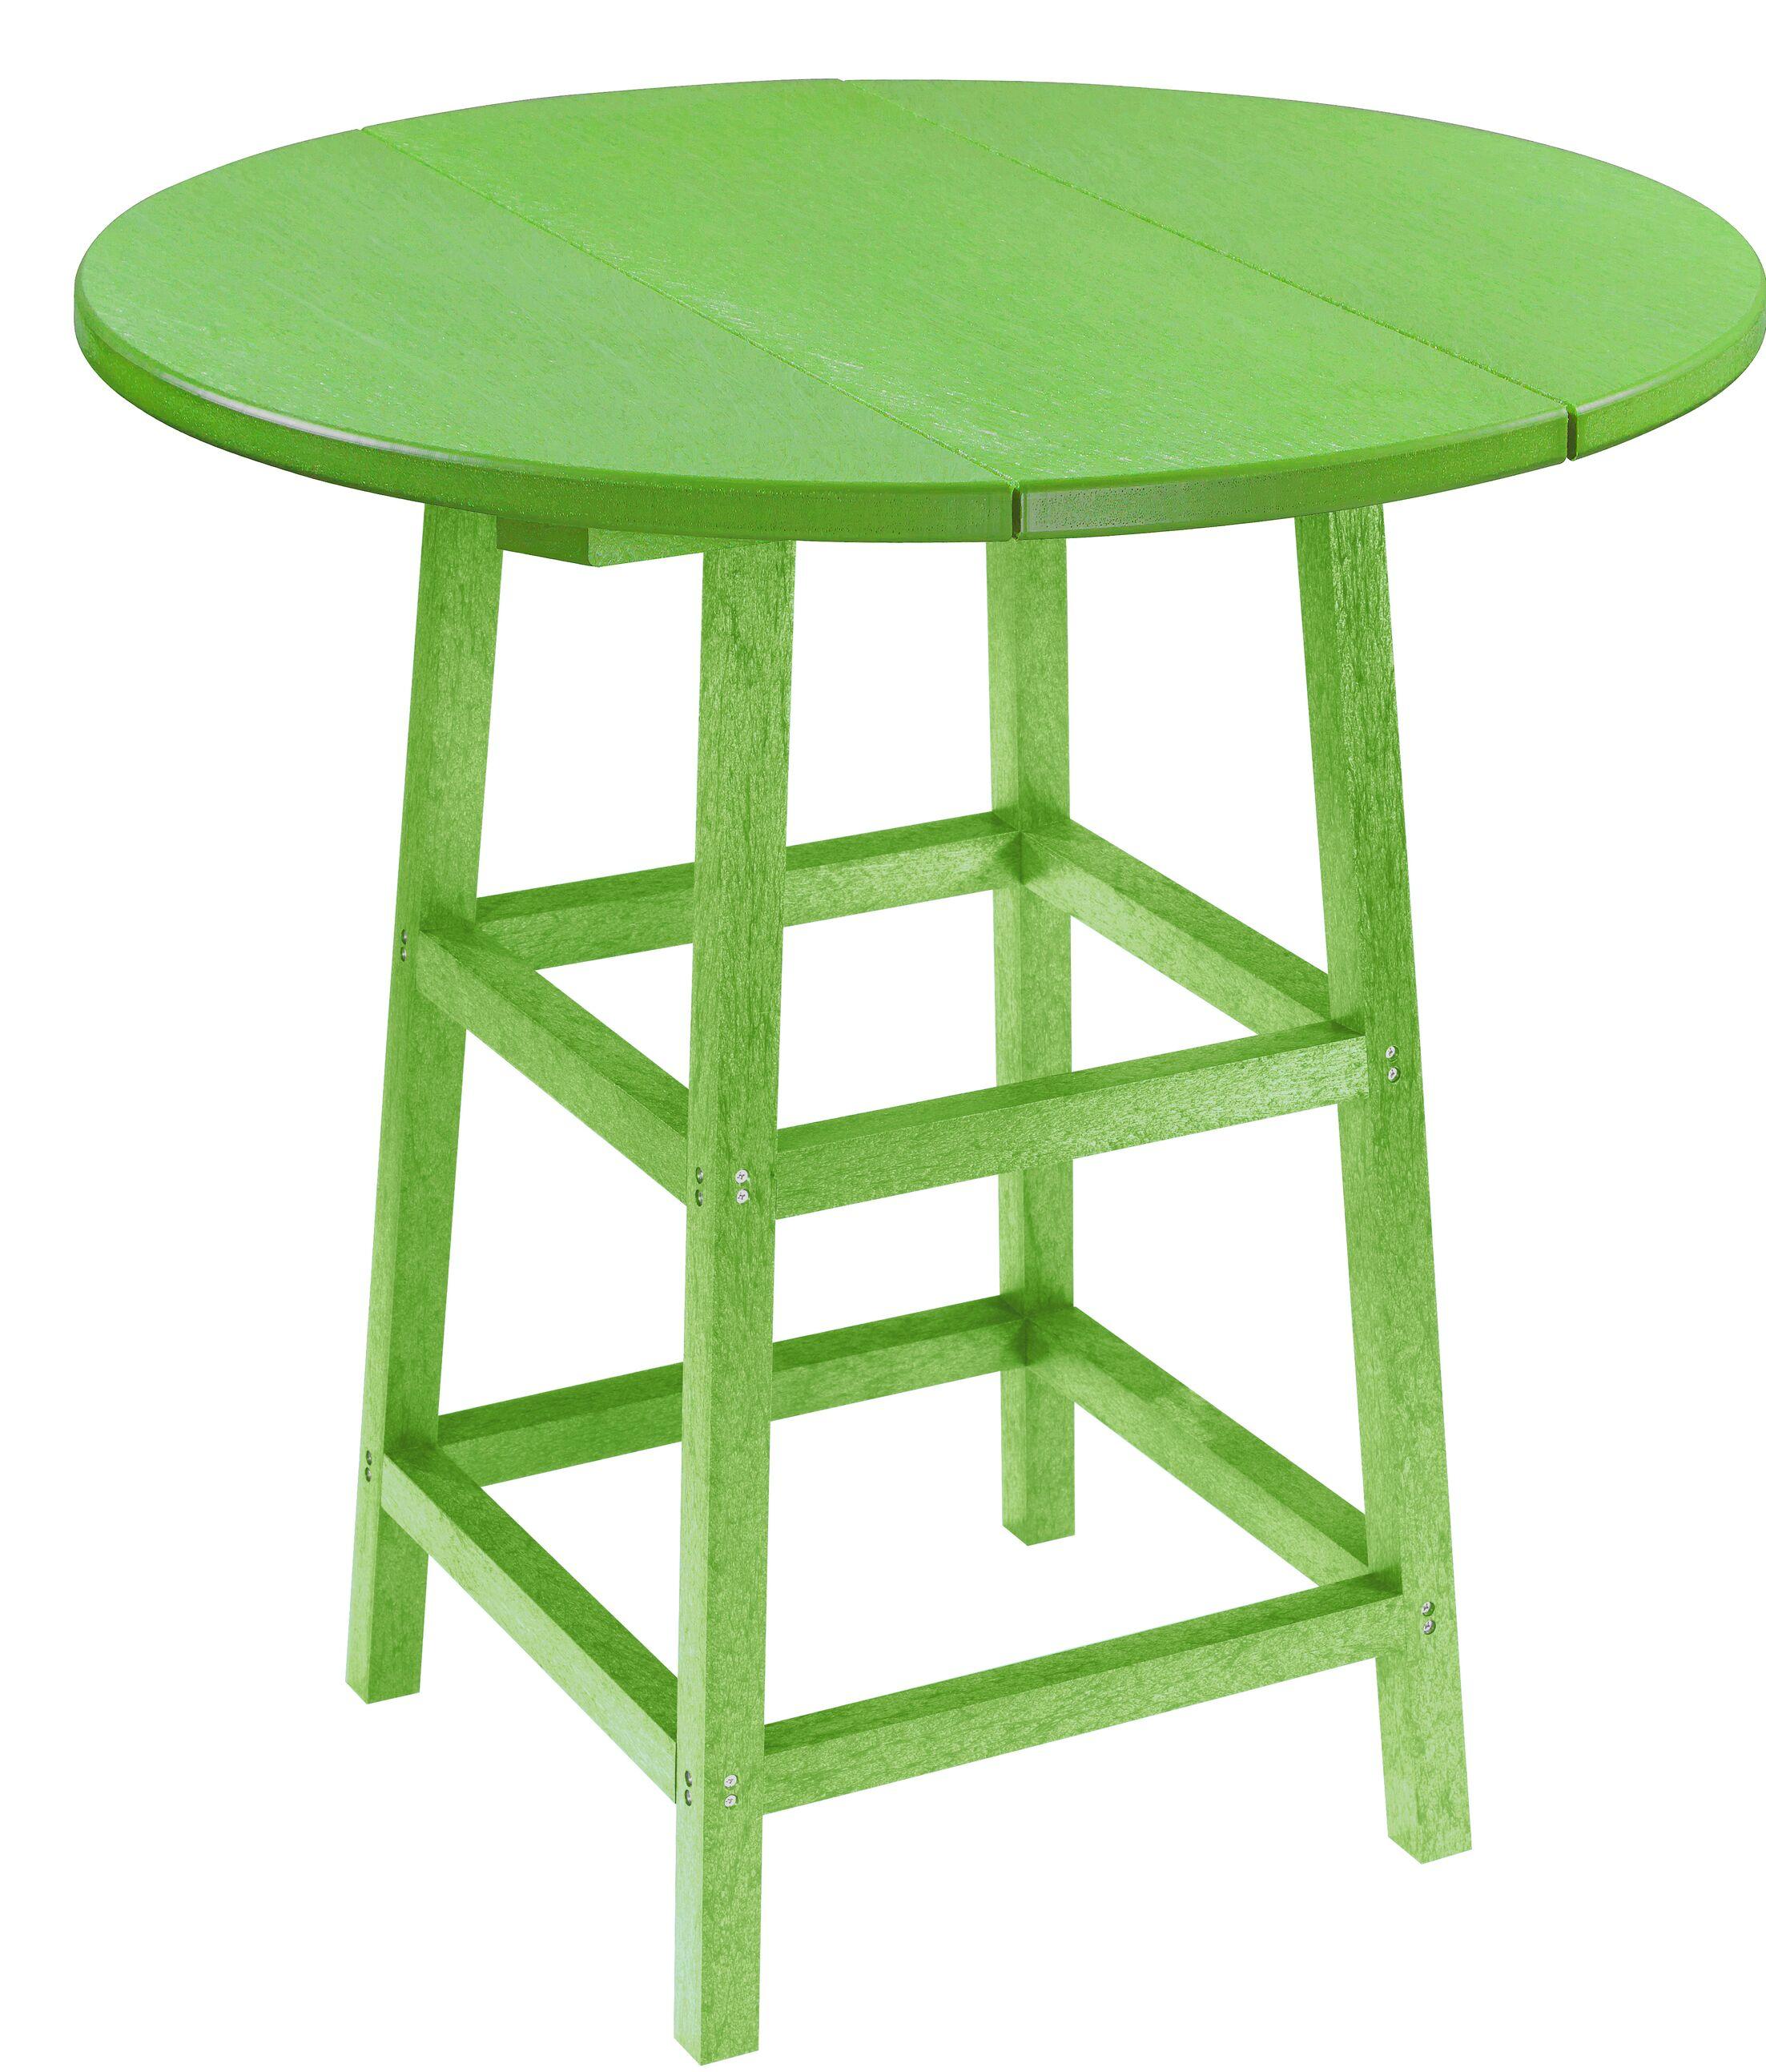 Kratochvil Plastic Bistro Table Color: Kiwi Green, Table Size: 40